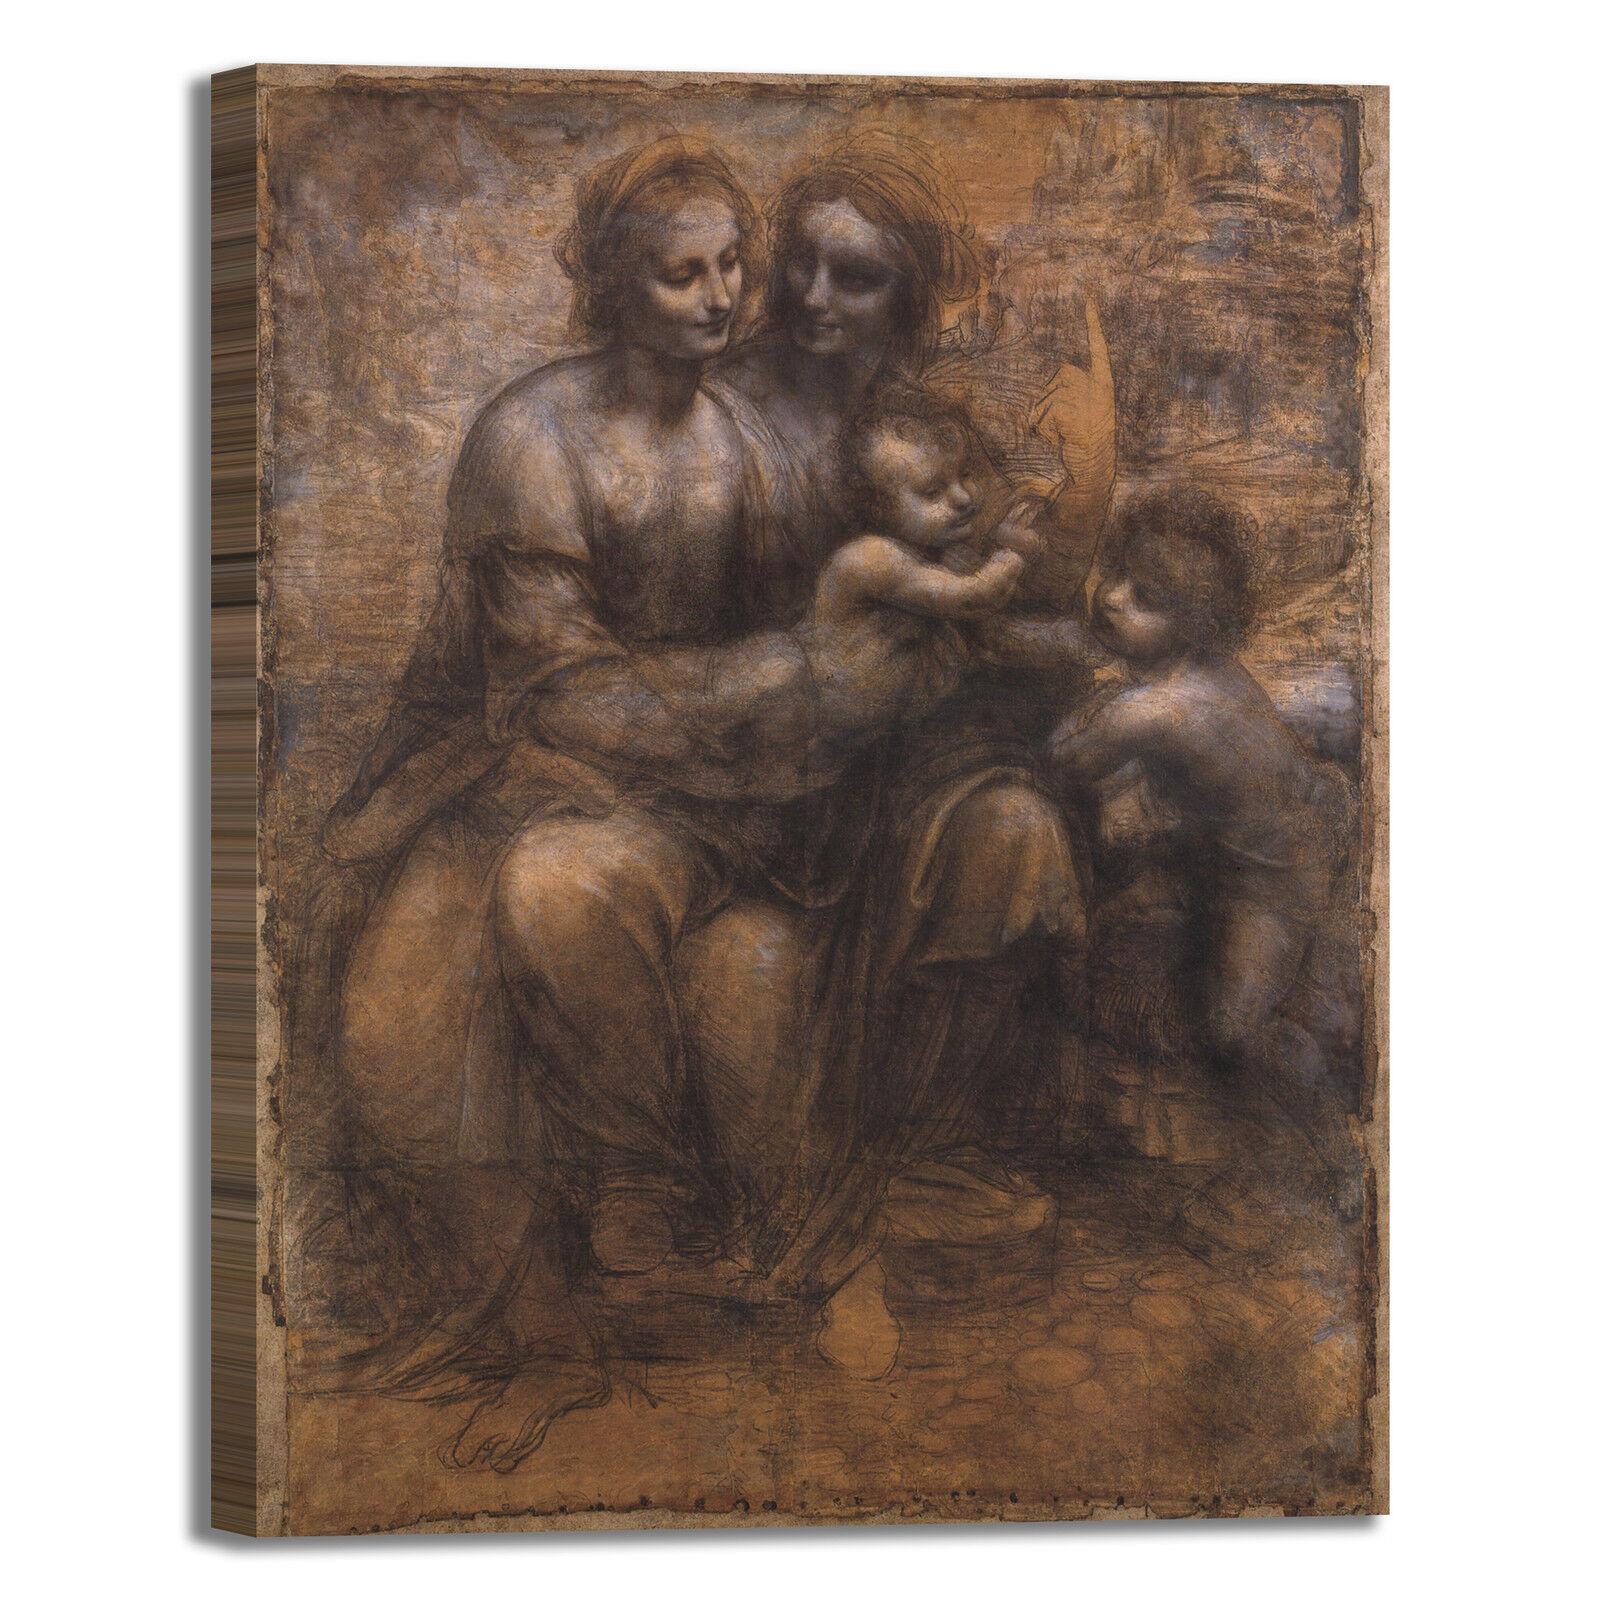 Da Vinci cartone di sant'Anna quadro stampa tela dipinto telaio arrossoo casa